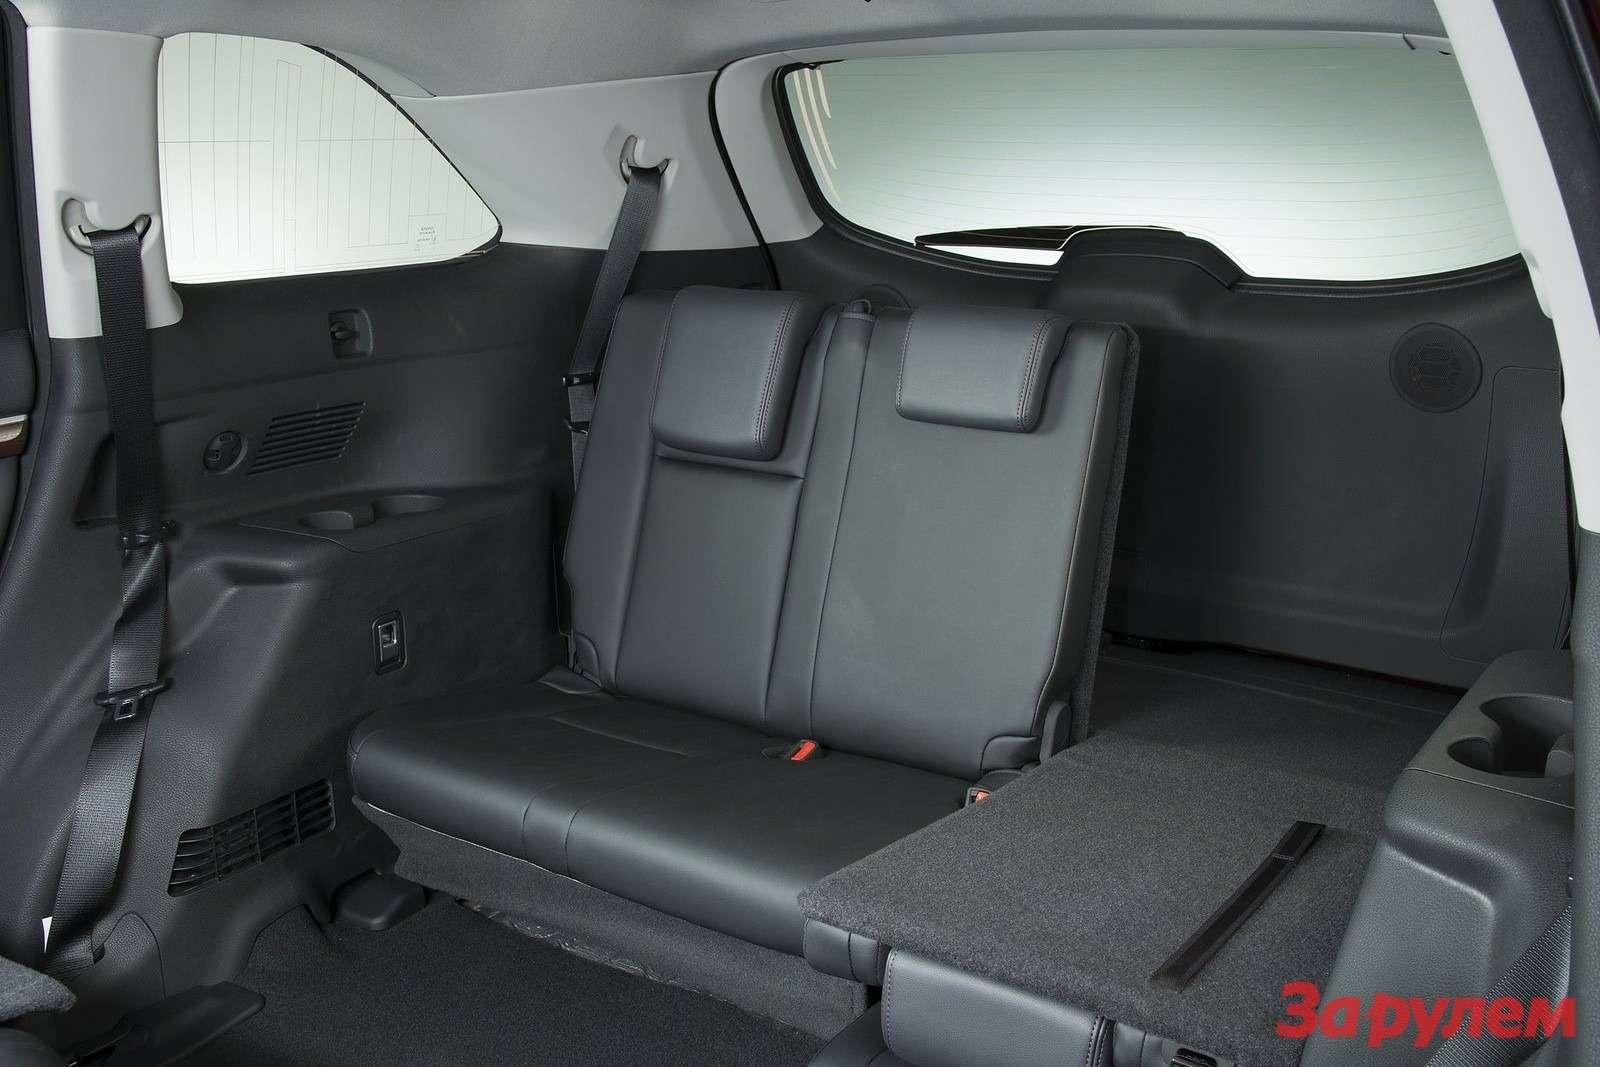 Toyota Highlander 2014 1600x1200 wallpaper 14